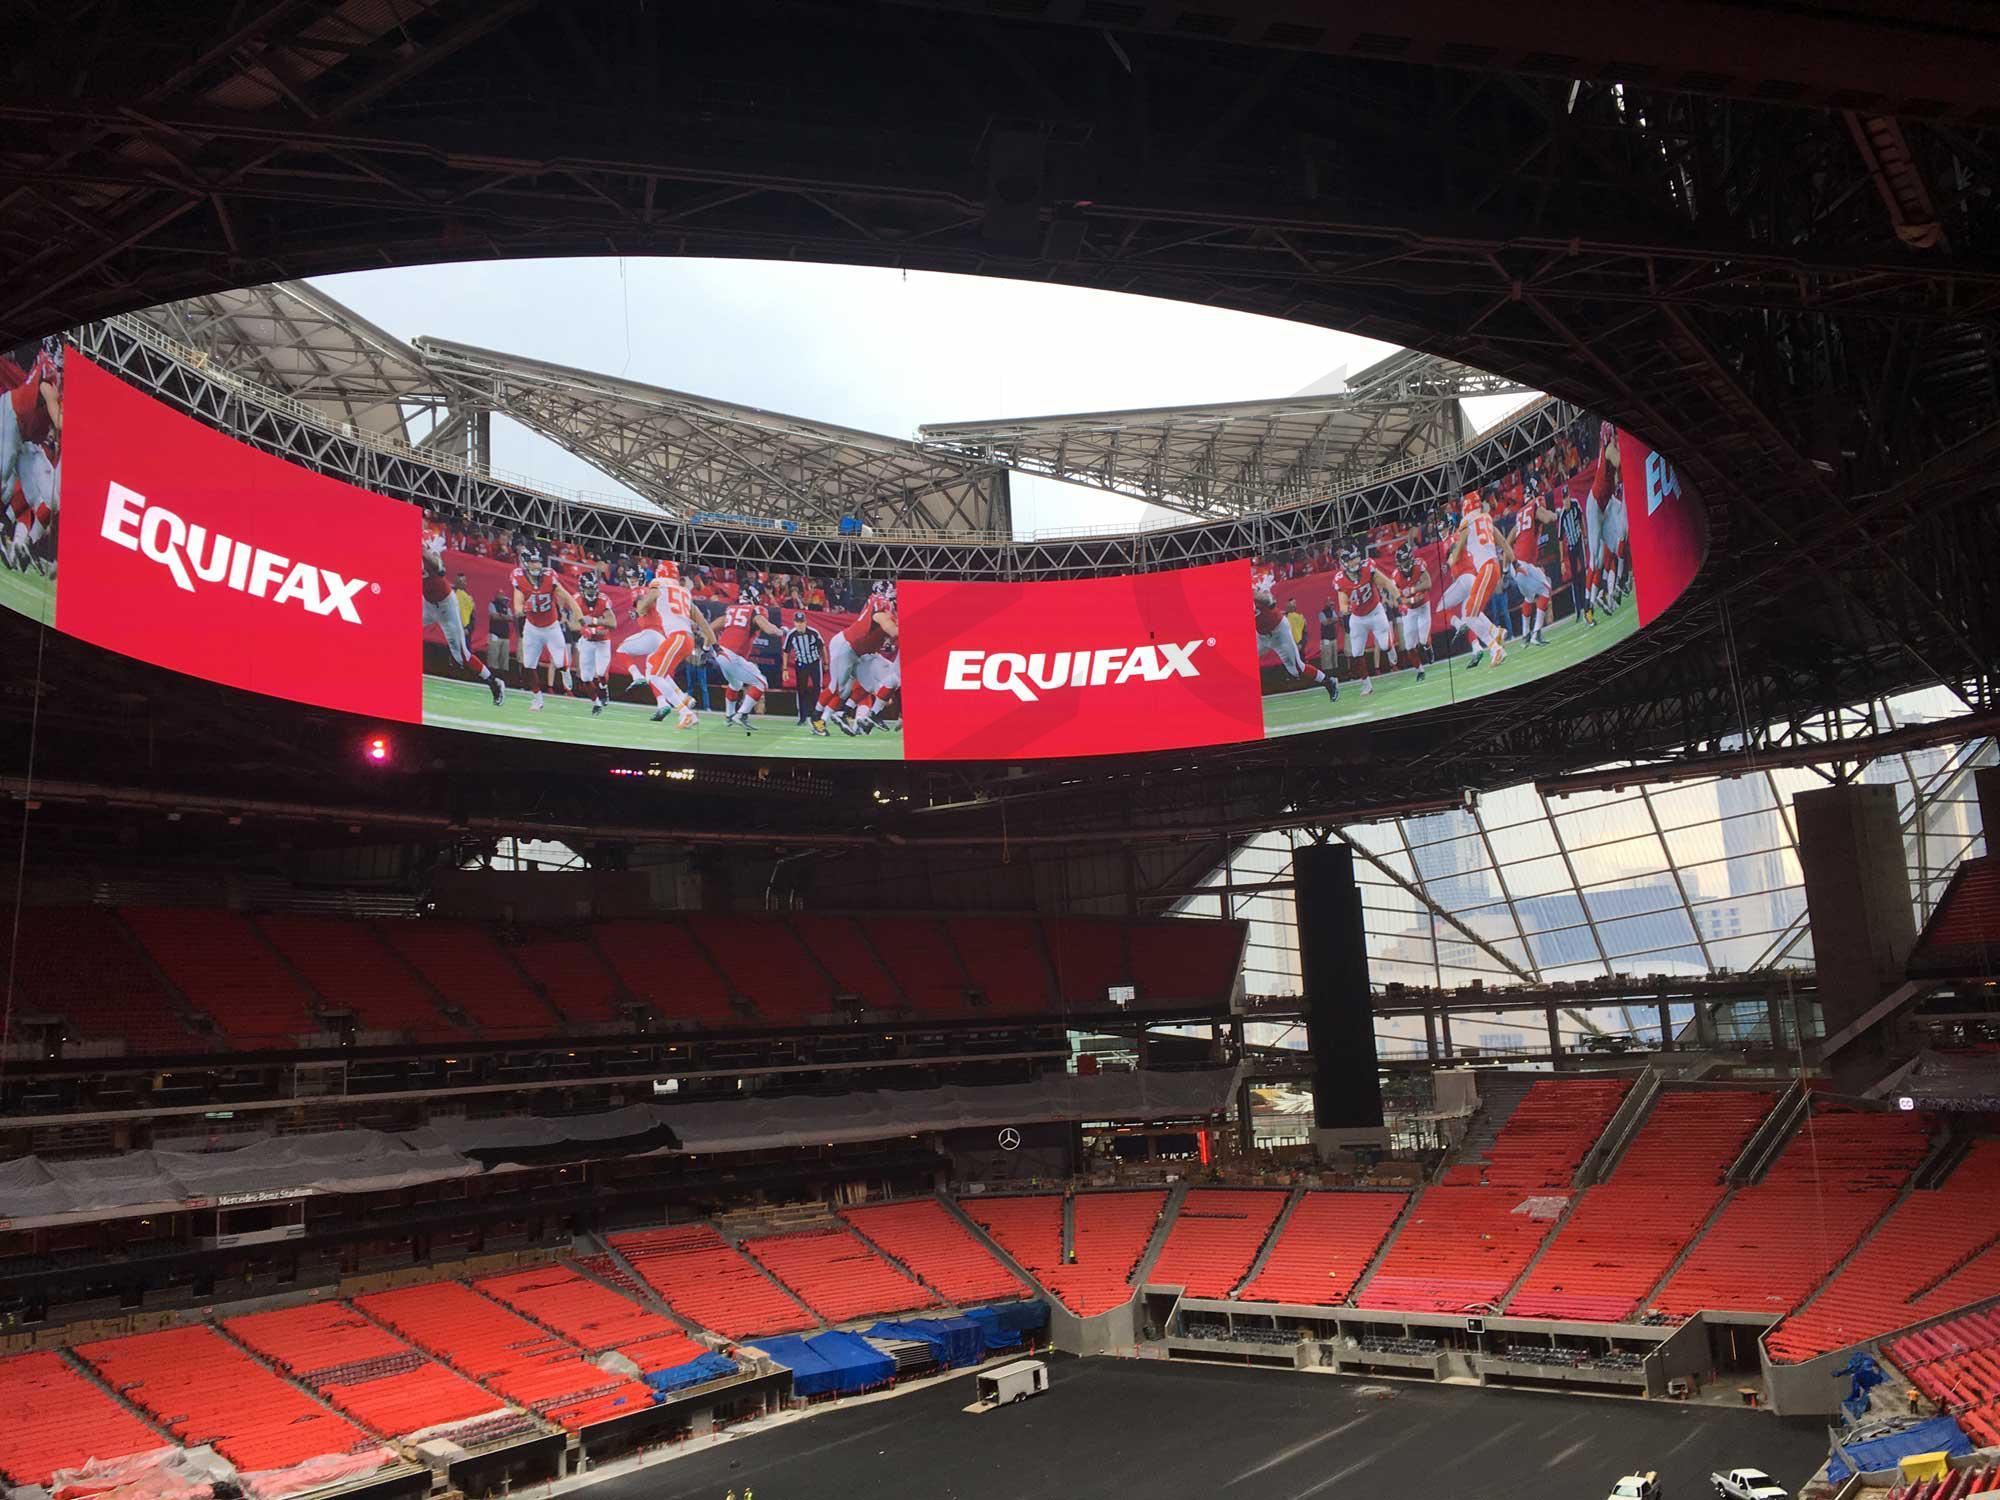 Open Roof and Scoreboard